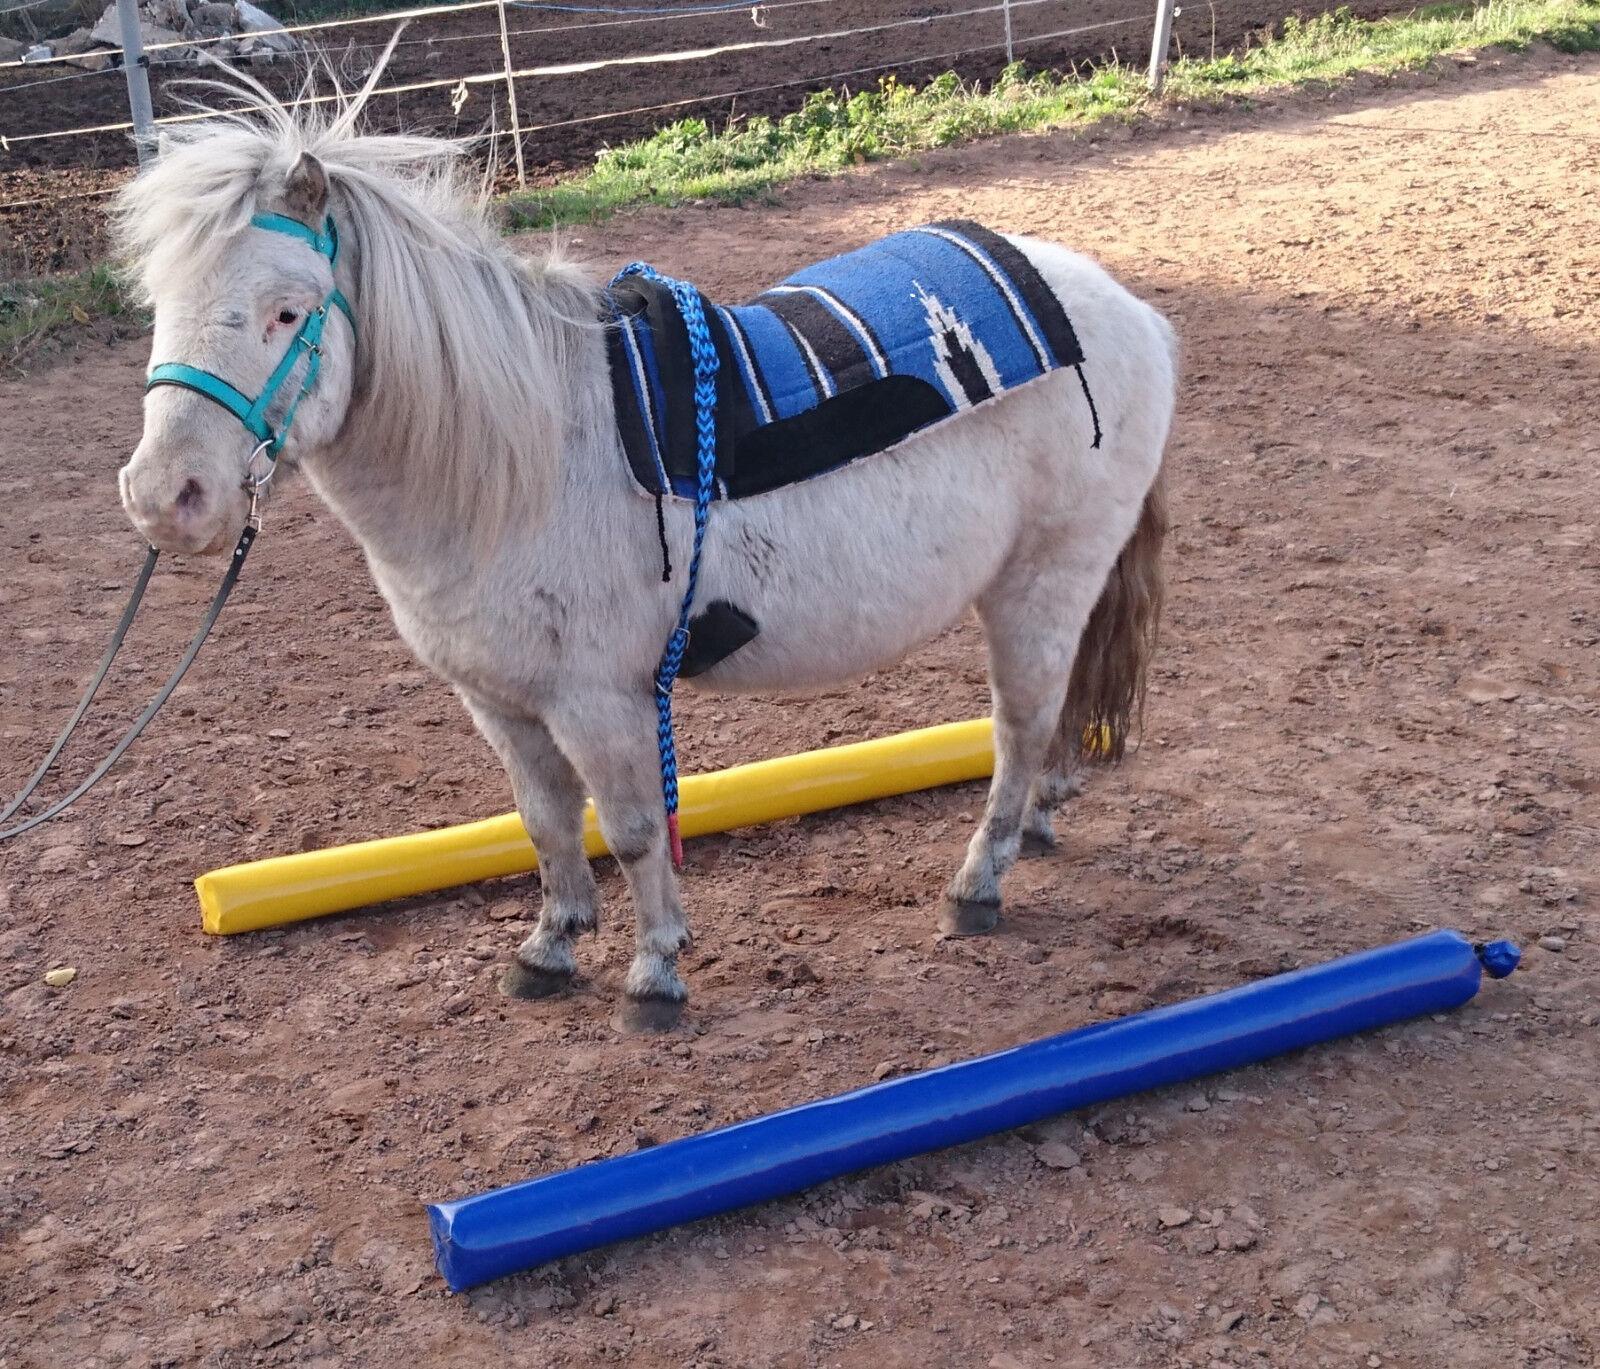 8x ground work Rods 4 Blau 4 Gelb 1,5m for pony Dual activation